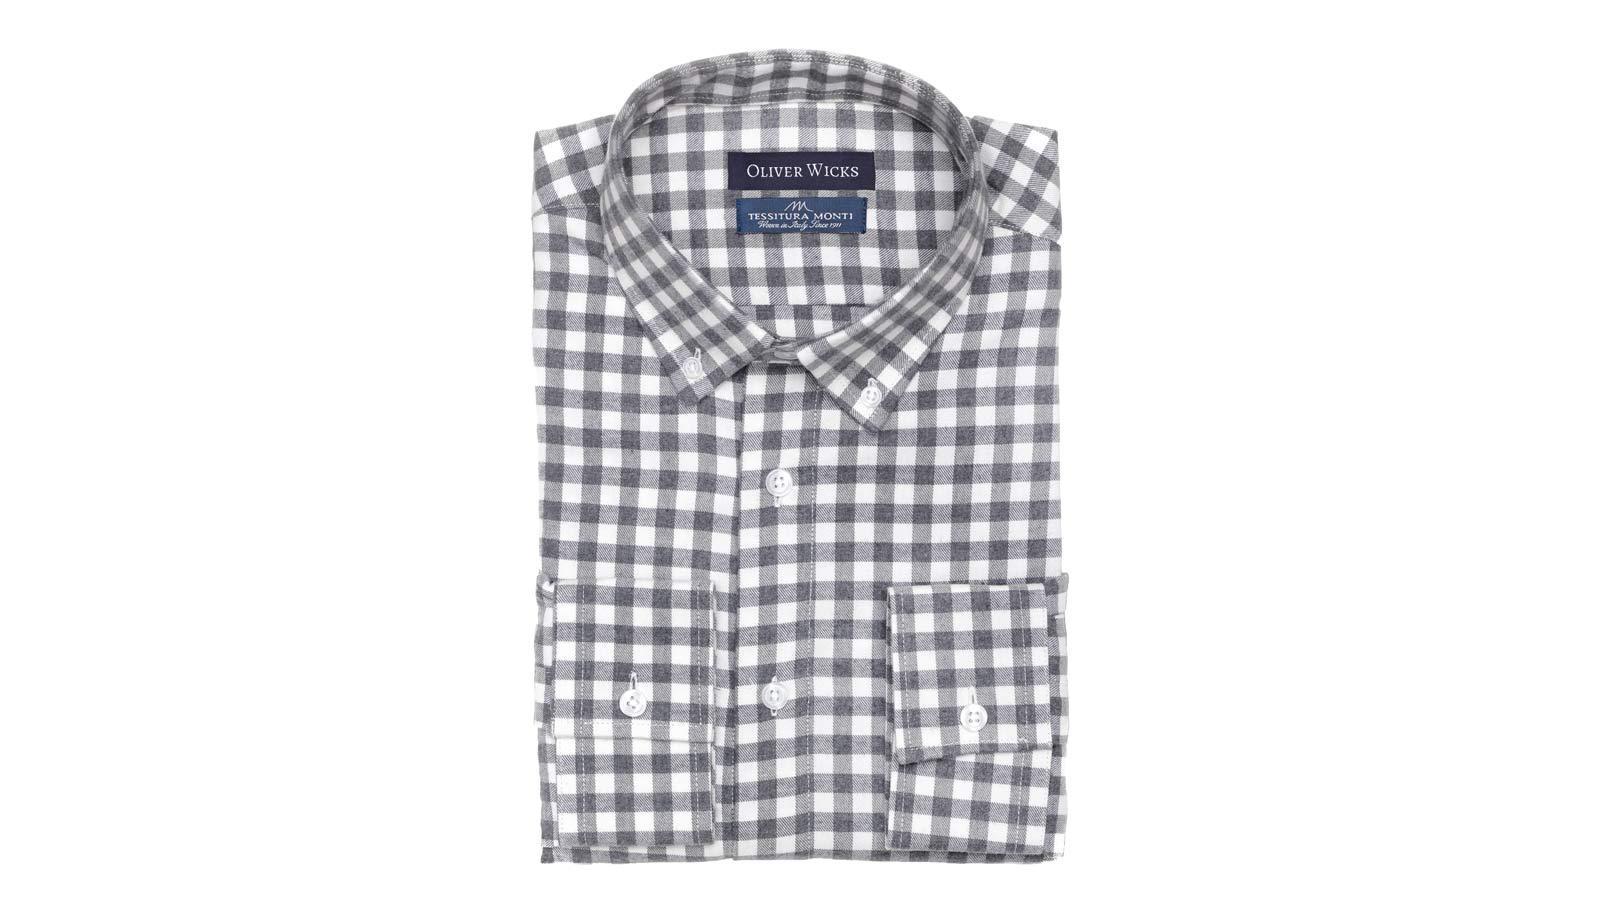 Men's Style Pro Grey Check Shirt - slider image 1